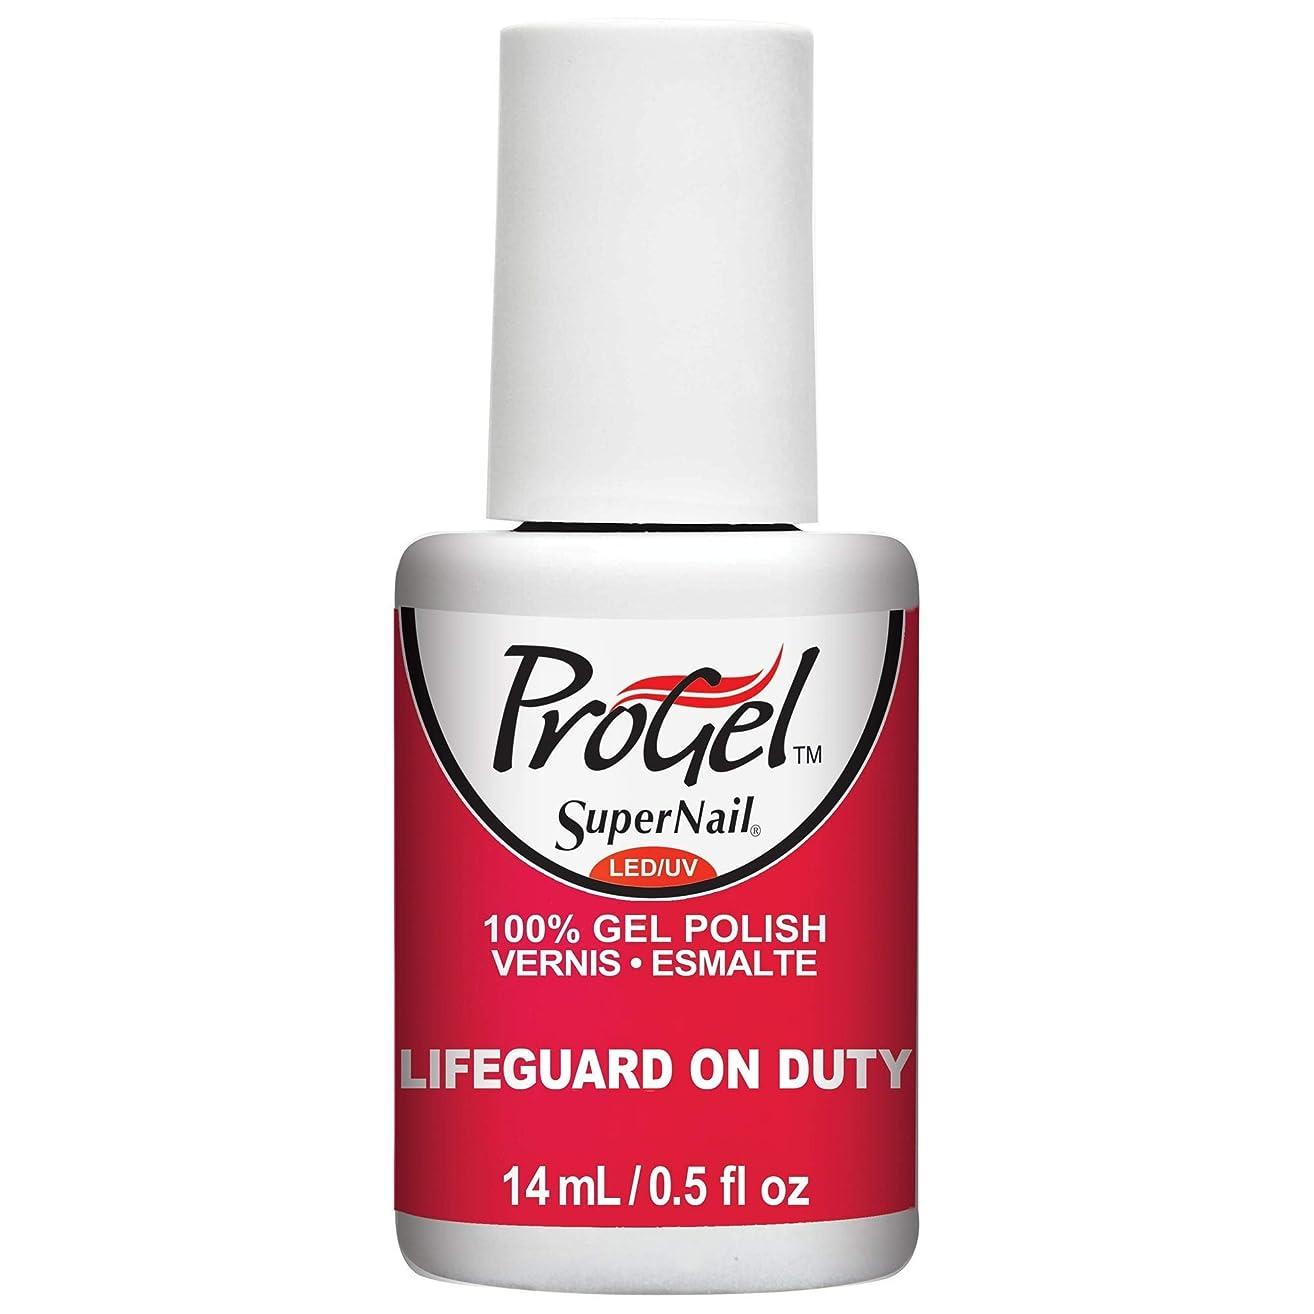 納税者お誕生日自分自身SuperNail ProGel Gel Polish - Lifeguard on Duty - 0.5oz / 14ml